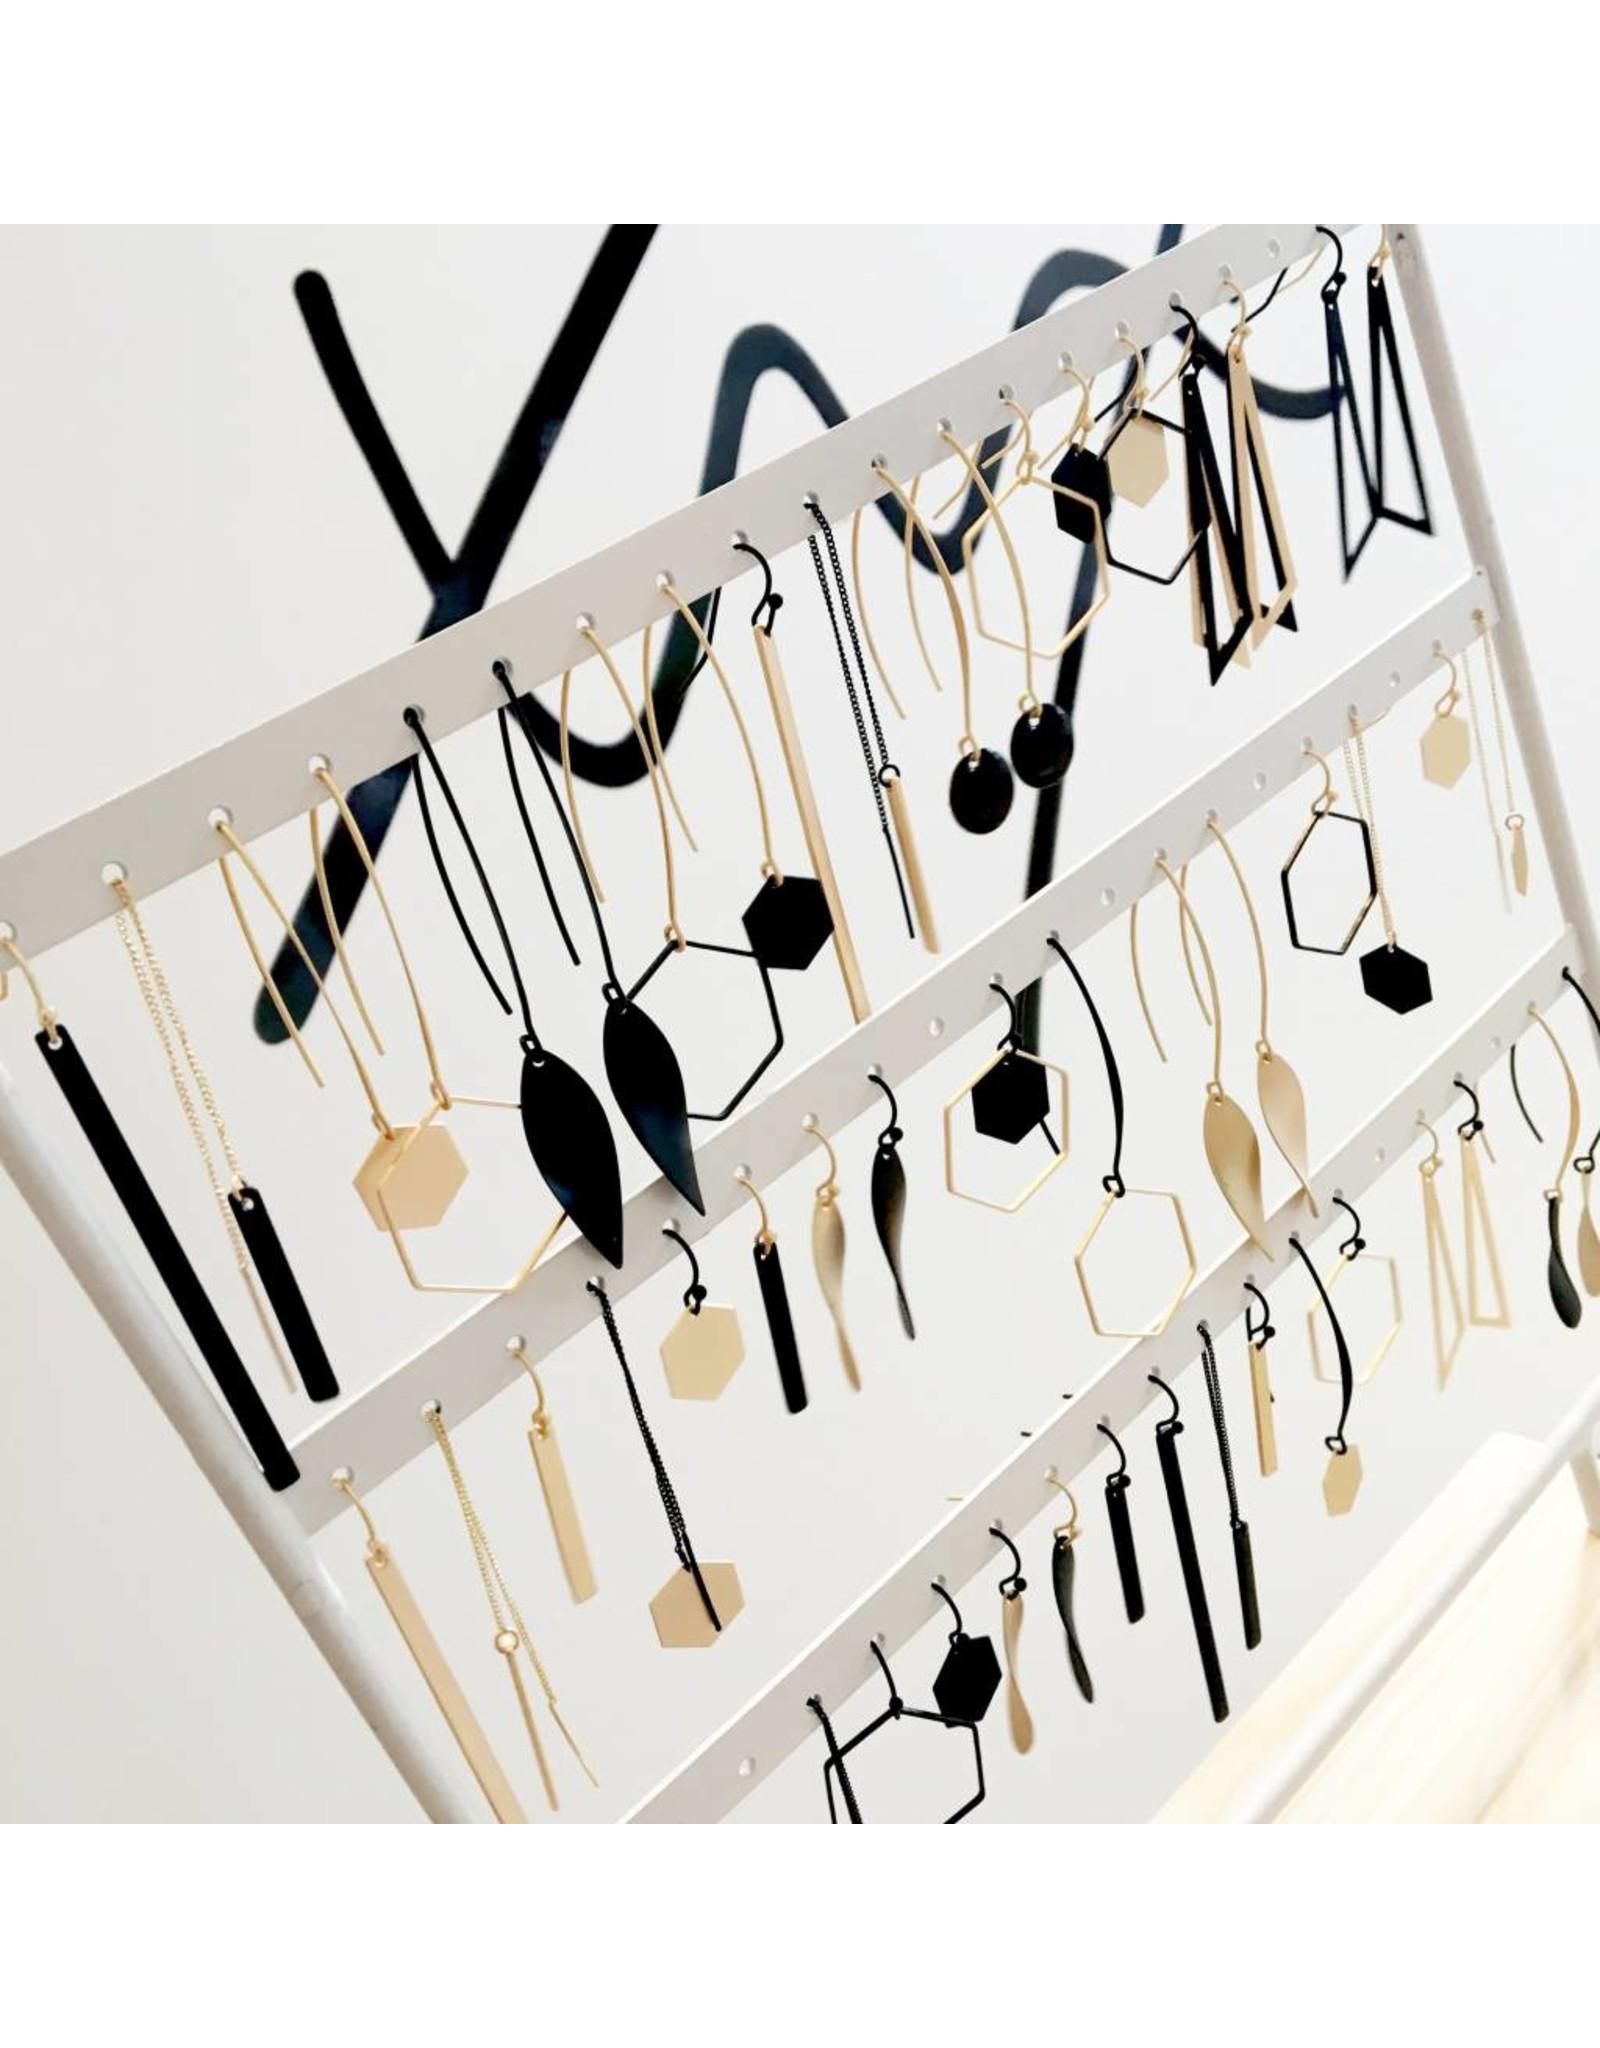 oorbEllen mix&match staafje kort mat zwart doortrekker goud